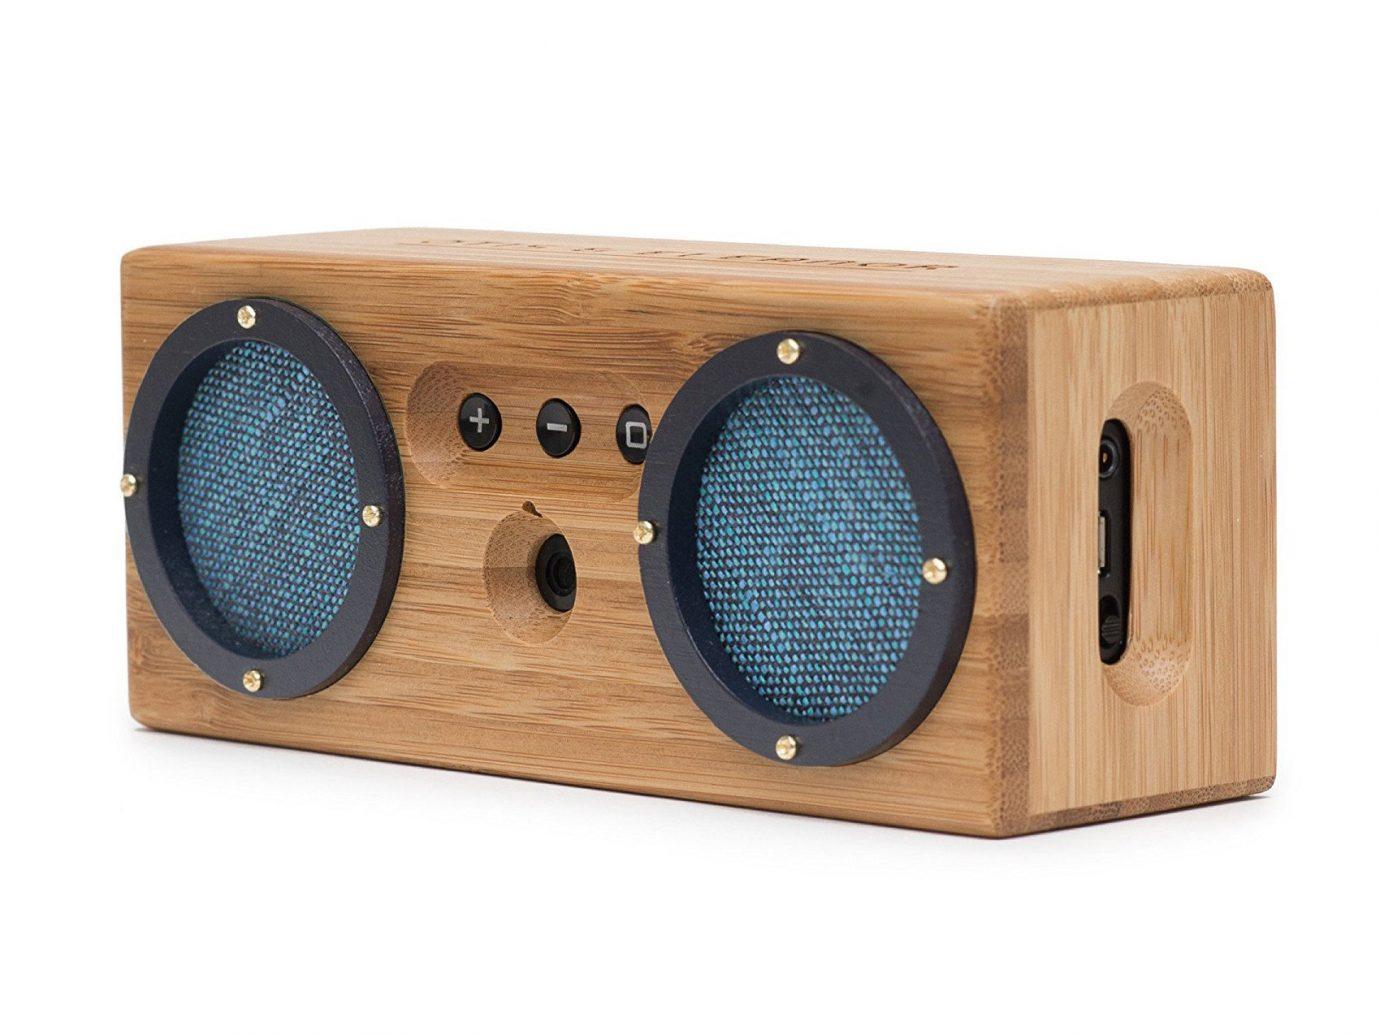 Gift Guides Travel Shop Travel Tech sound box wooden indoor audio equipment audio computer speaker wood loudspeaker electronic instrument product design technology radio sound speaker product subwoofer